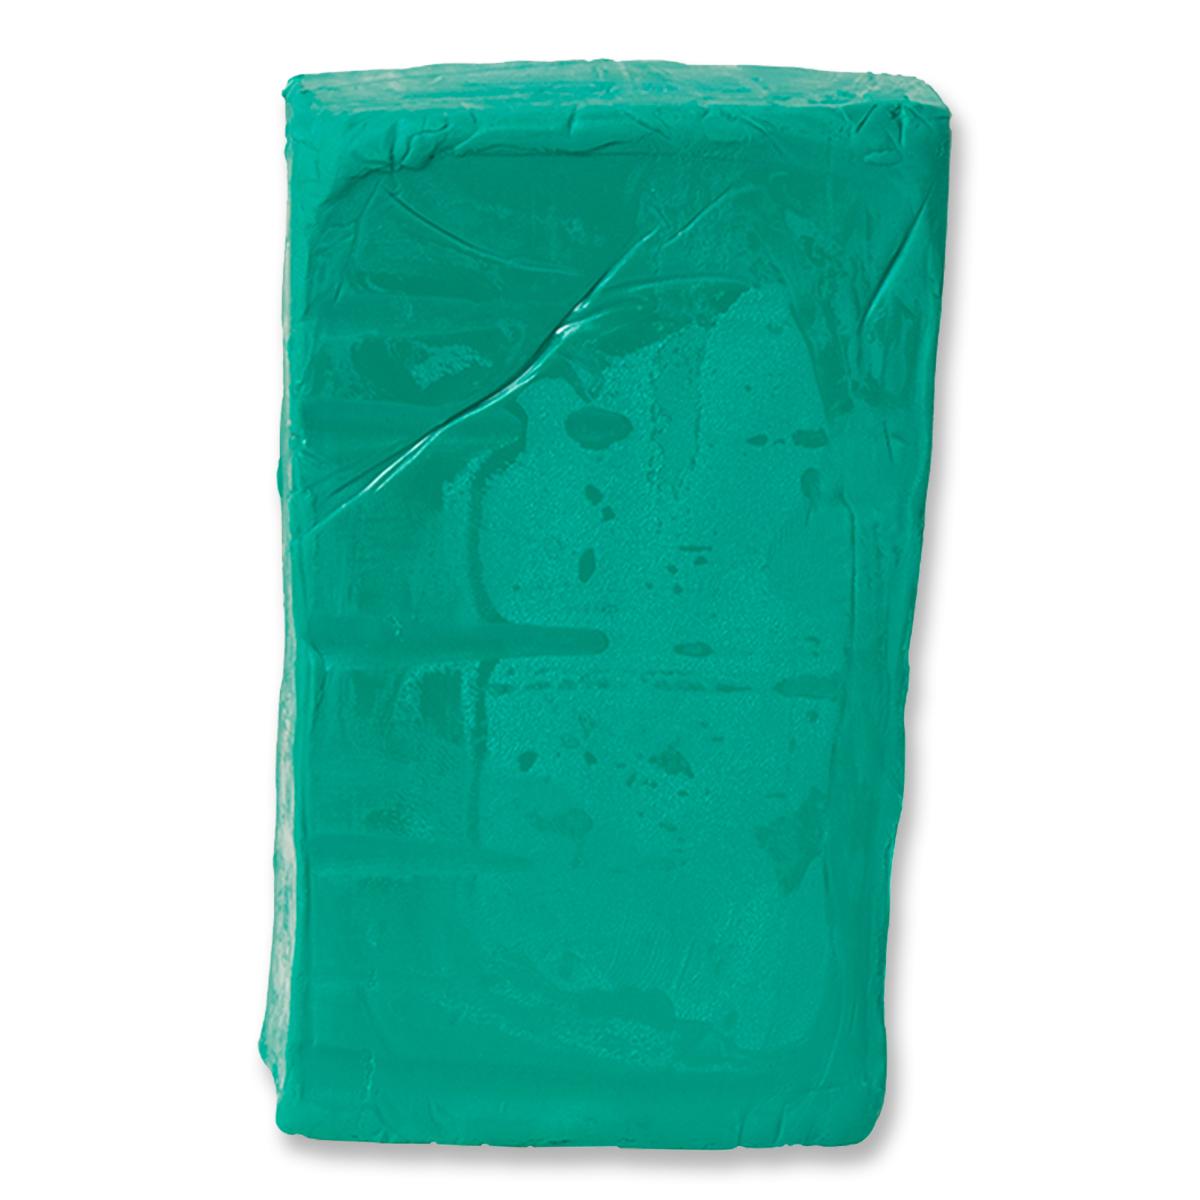 Pâte à modeler : verte